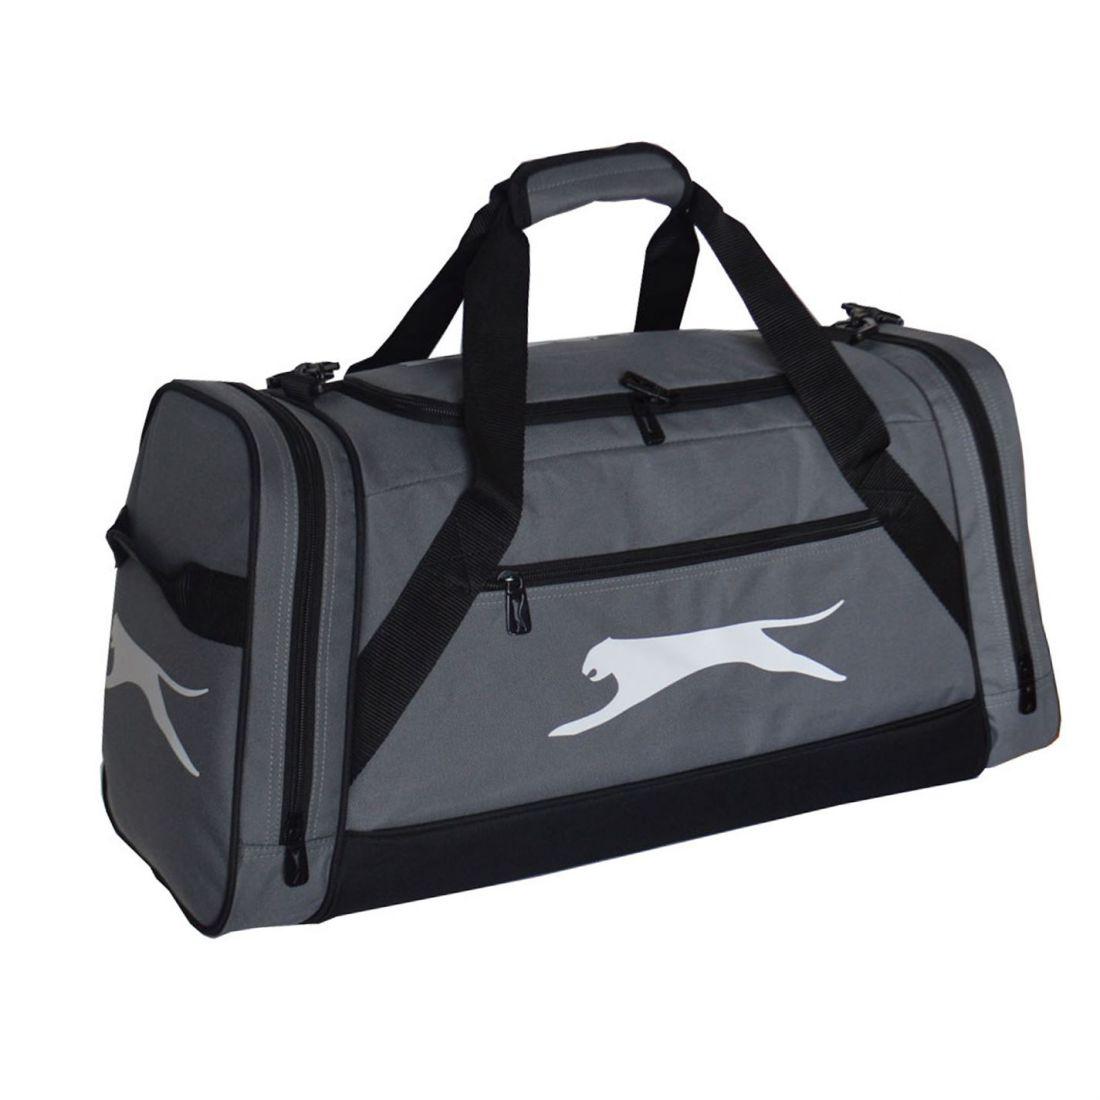 a0402ec02e Slazenger Medium Holdall Zip Pockets Baggage Traveling Sack Accessory 5 5  di 6 ...